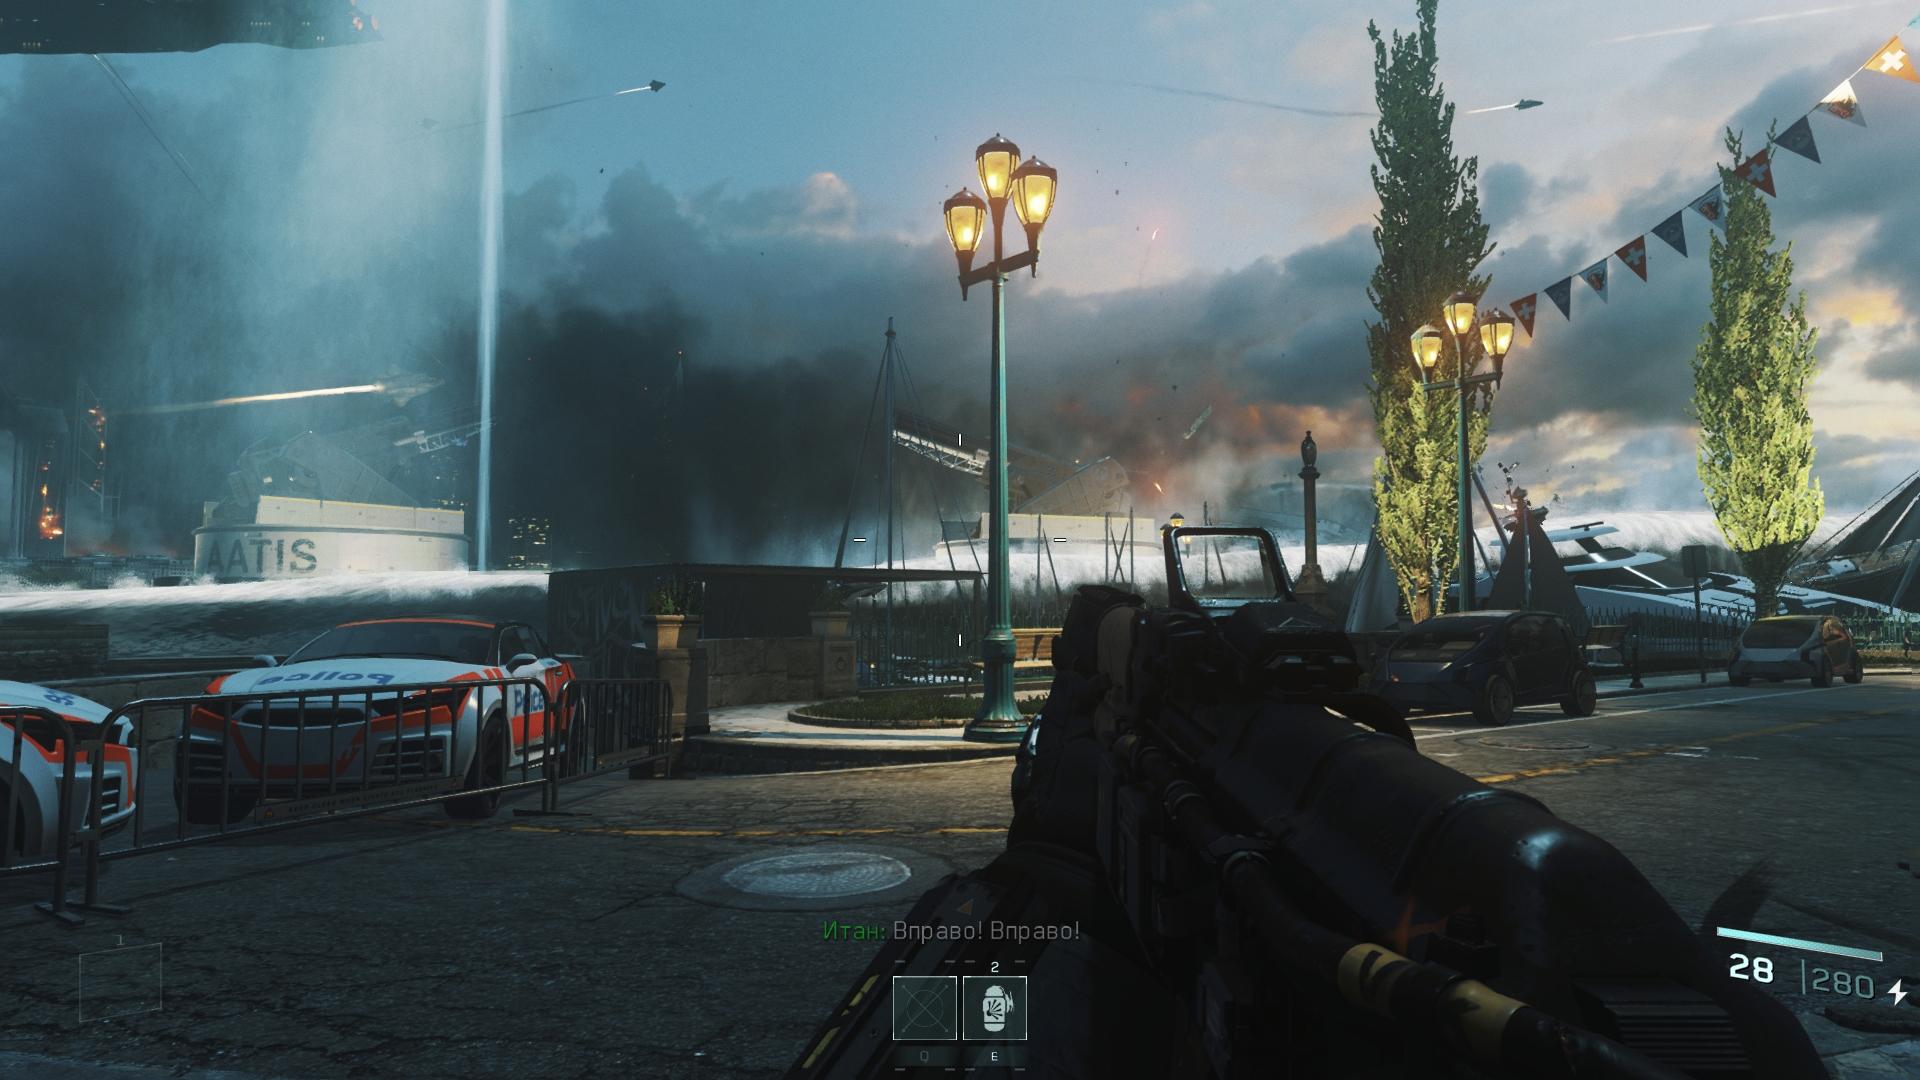 00020.Jpg - Call of Duty: Infinite Warfare